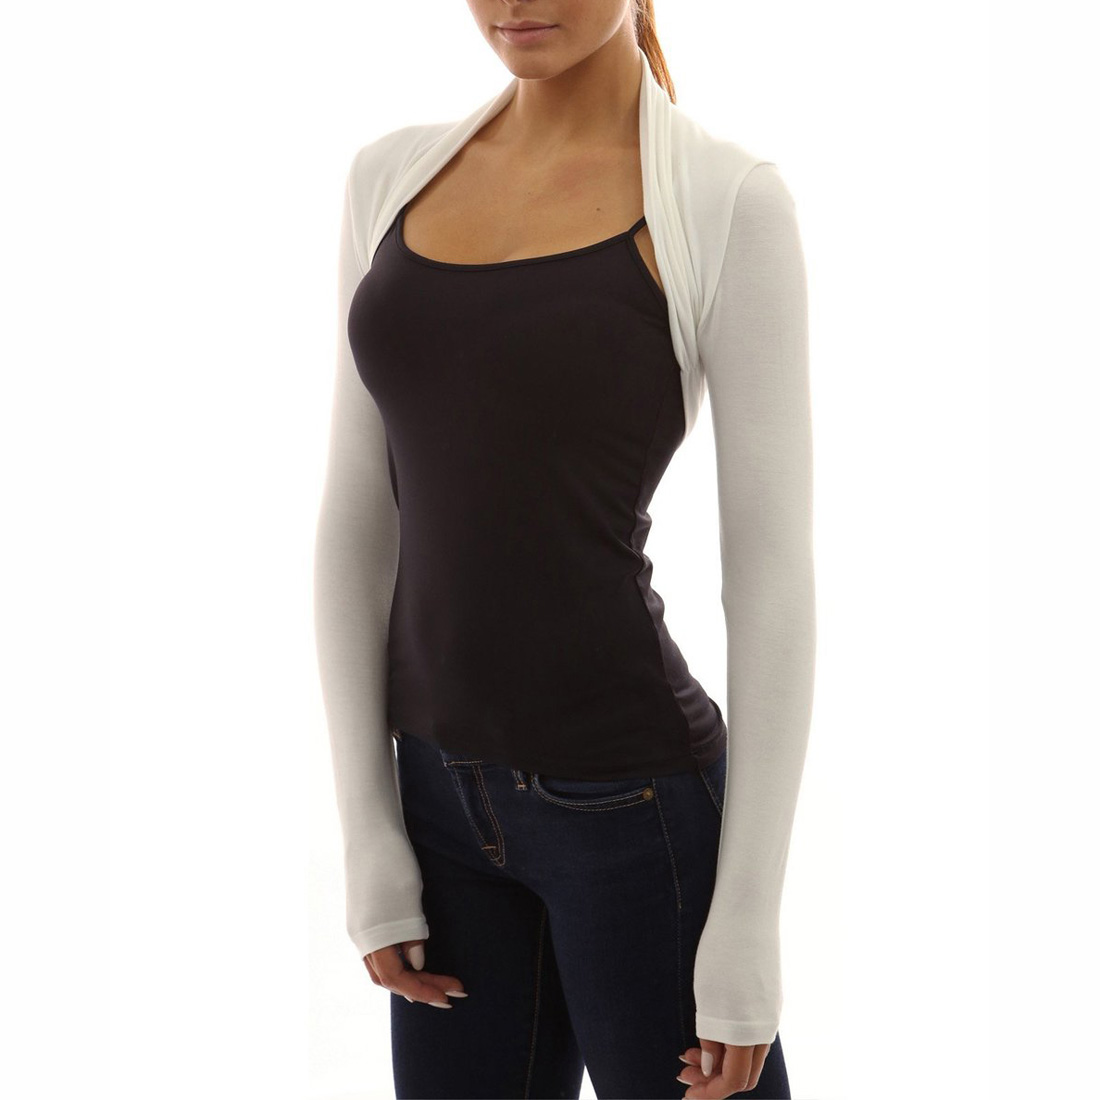 Long Sleeved Shrug Knitting Pattern : Womens Long Sleeve Bolero Shrug Knit Stretch Cropped Cardigan Top Sweater eBay